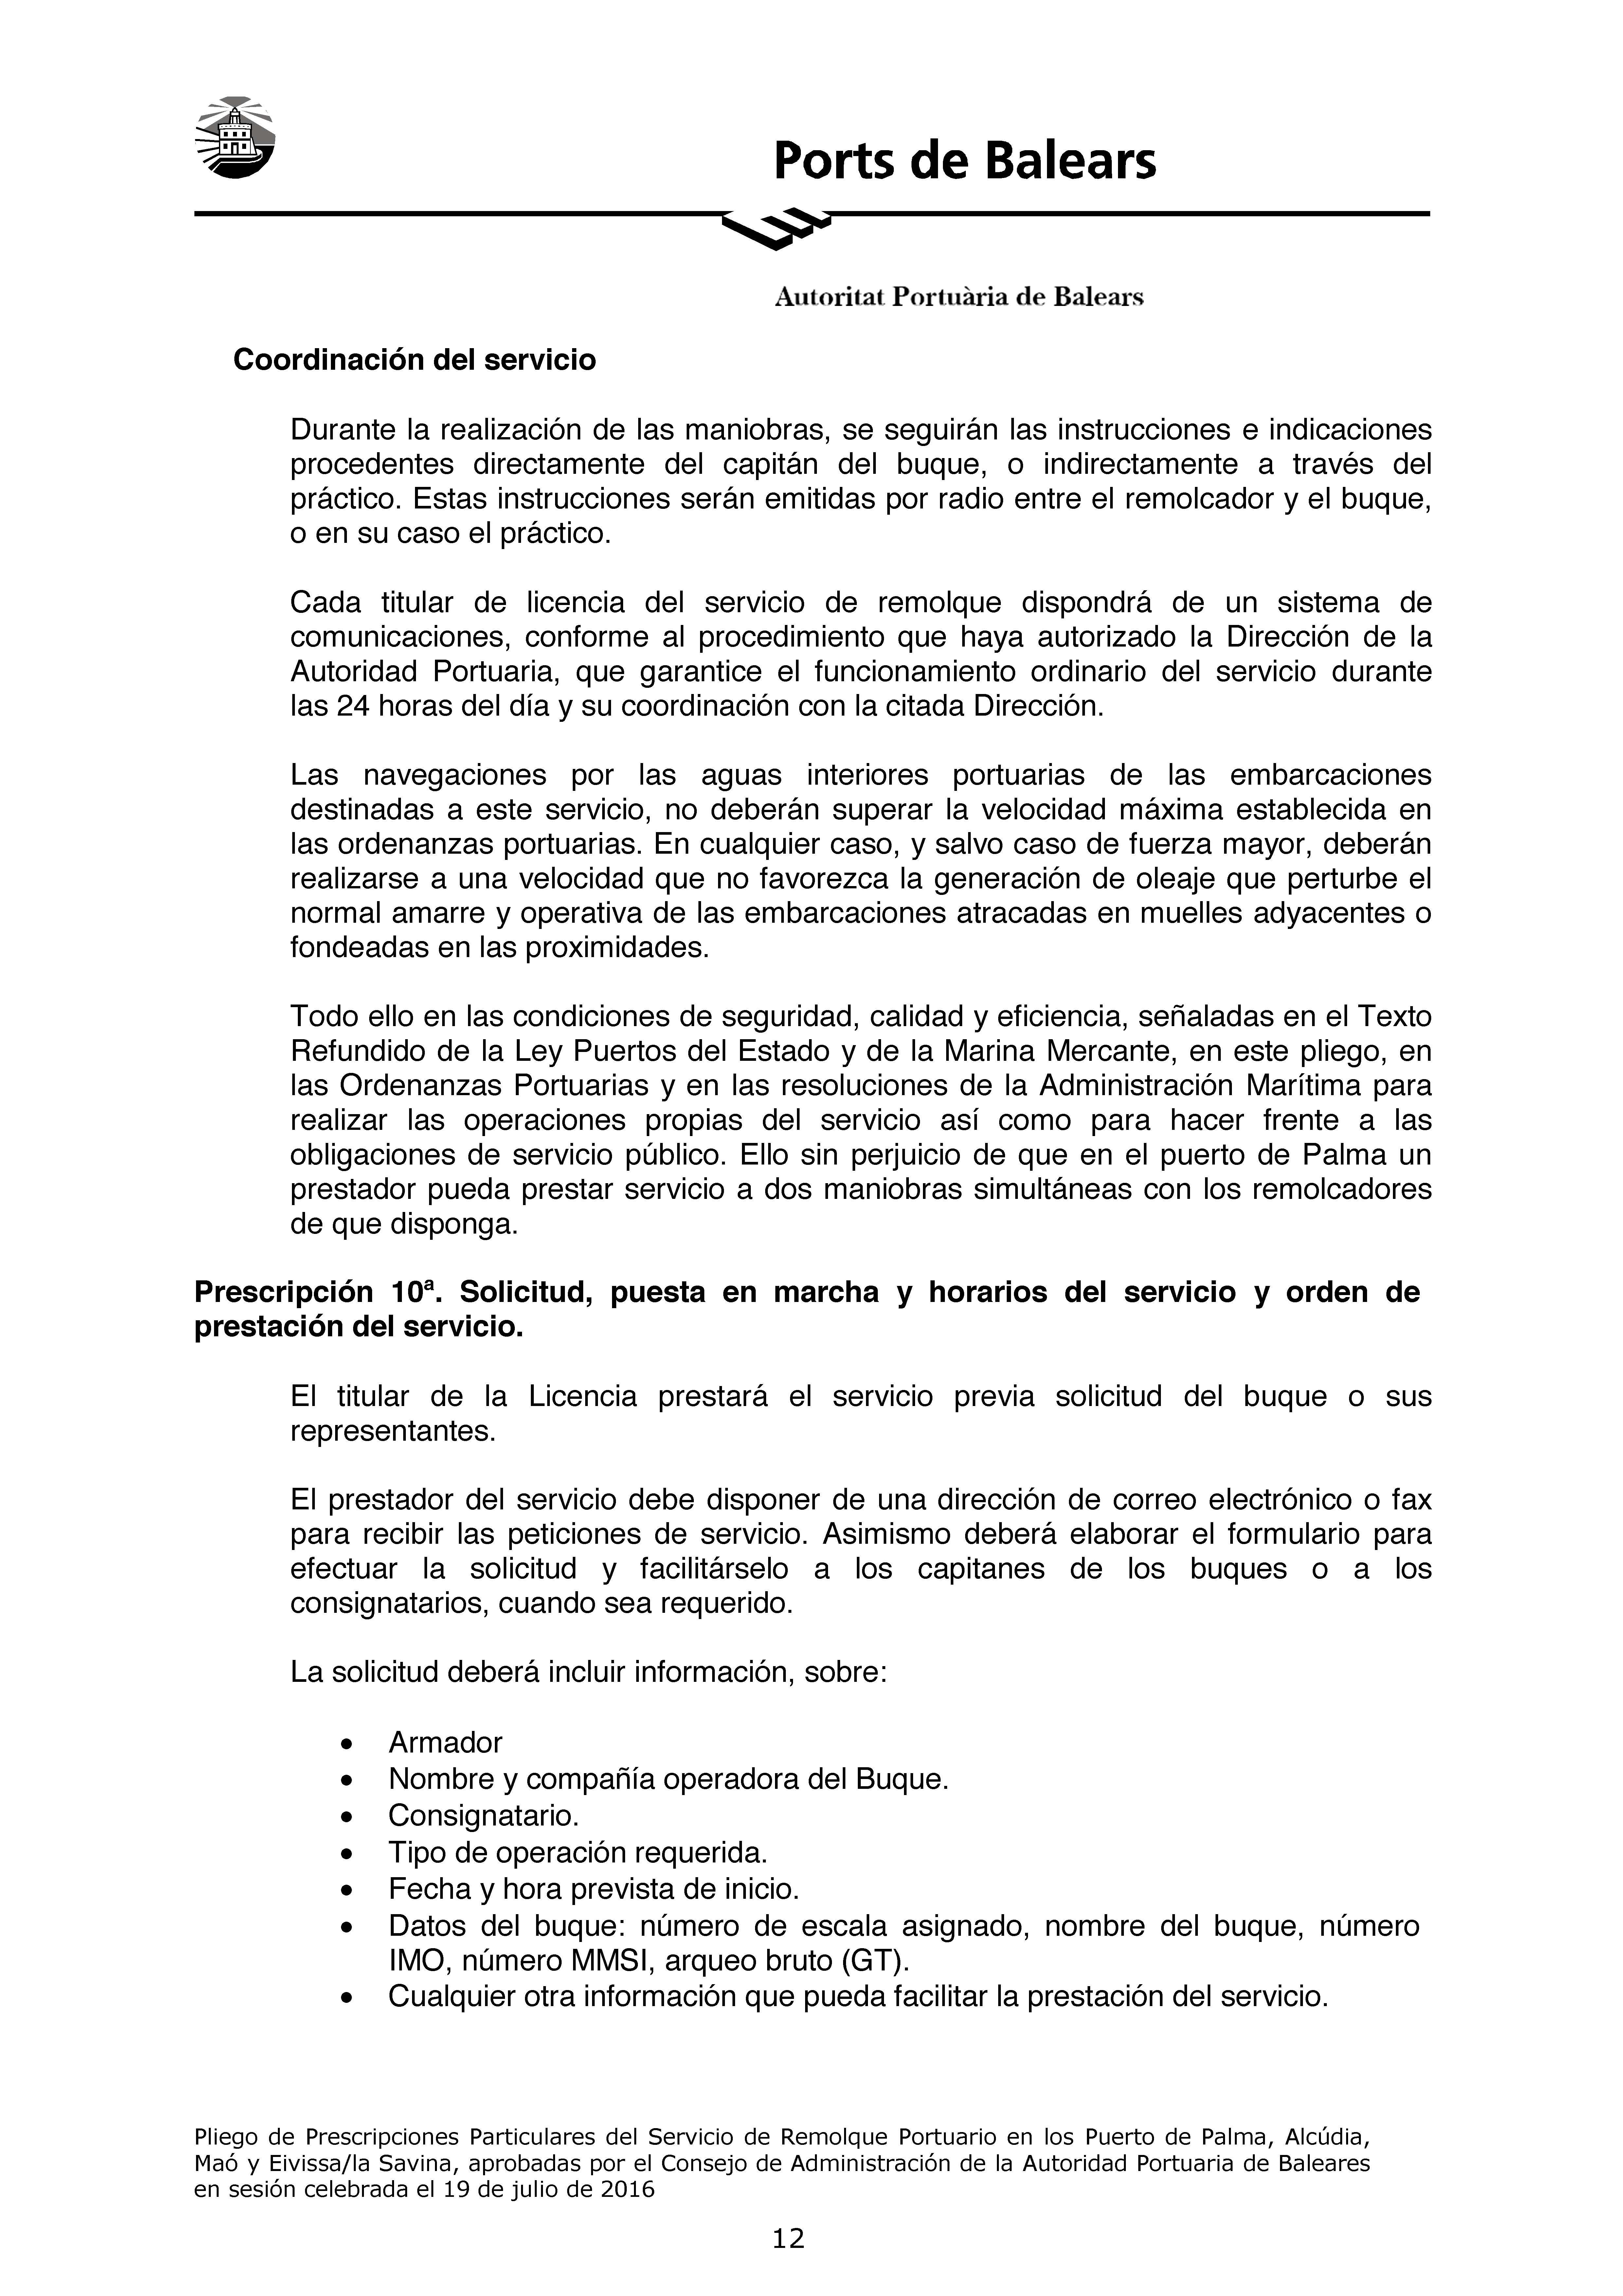 Documento | Ports de Balears